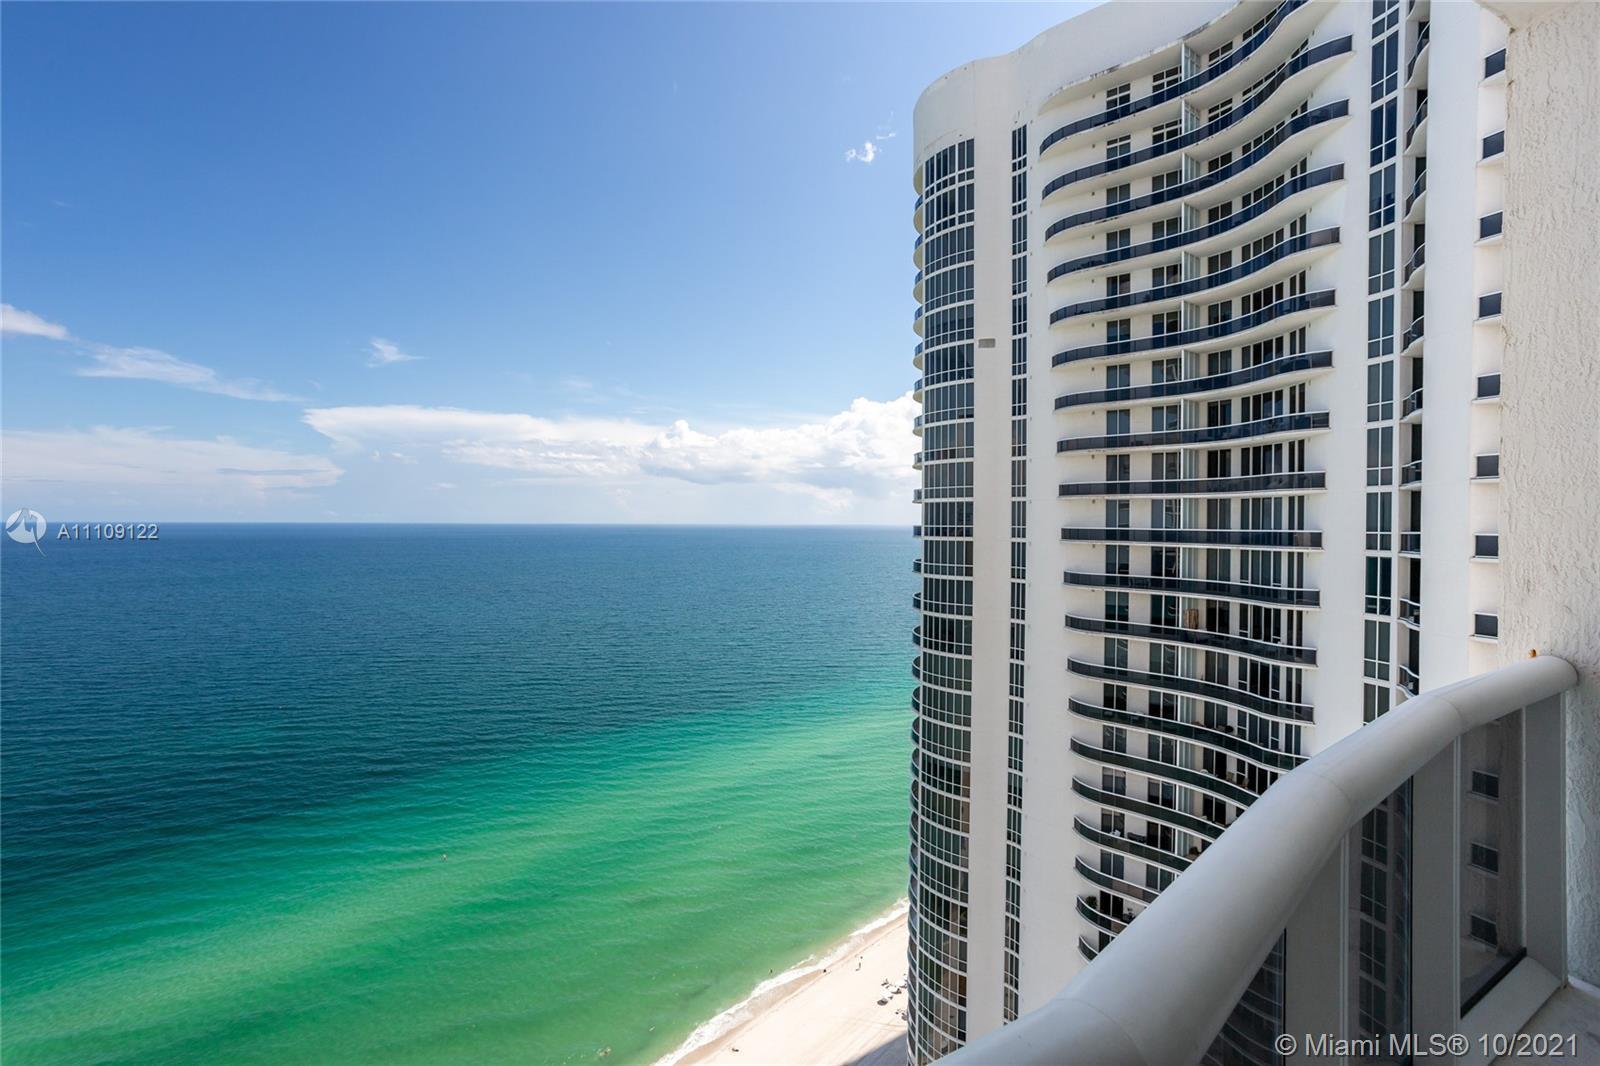 Trump Tower I #3406 - 16001 Collins Ave #3406, Sunny Isles Beach, FL 33160